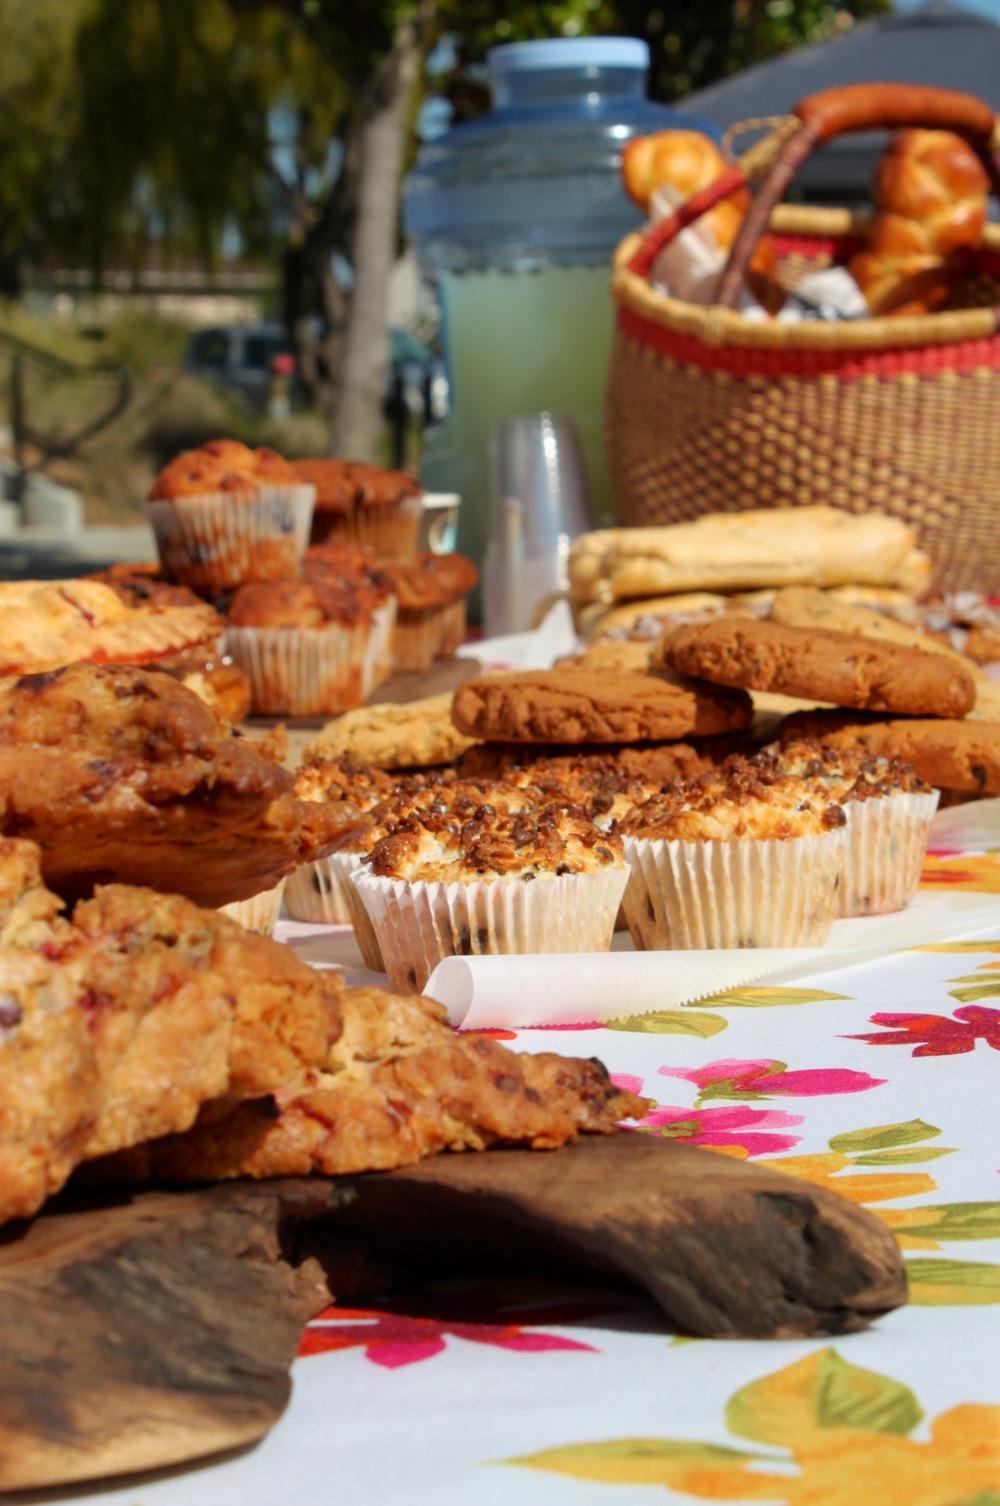 Criminal Baking Company at Santa Rosa's West End Farmers Market